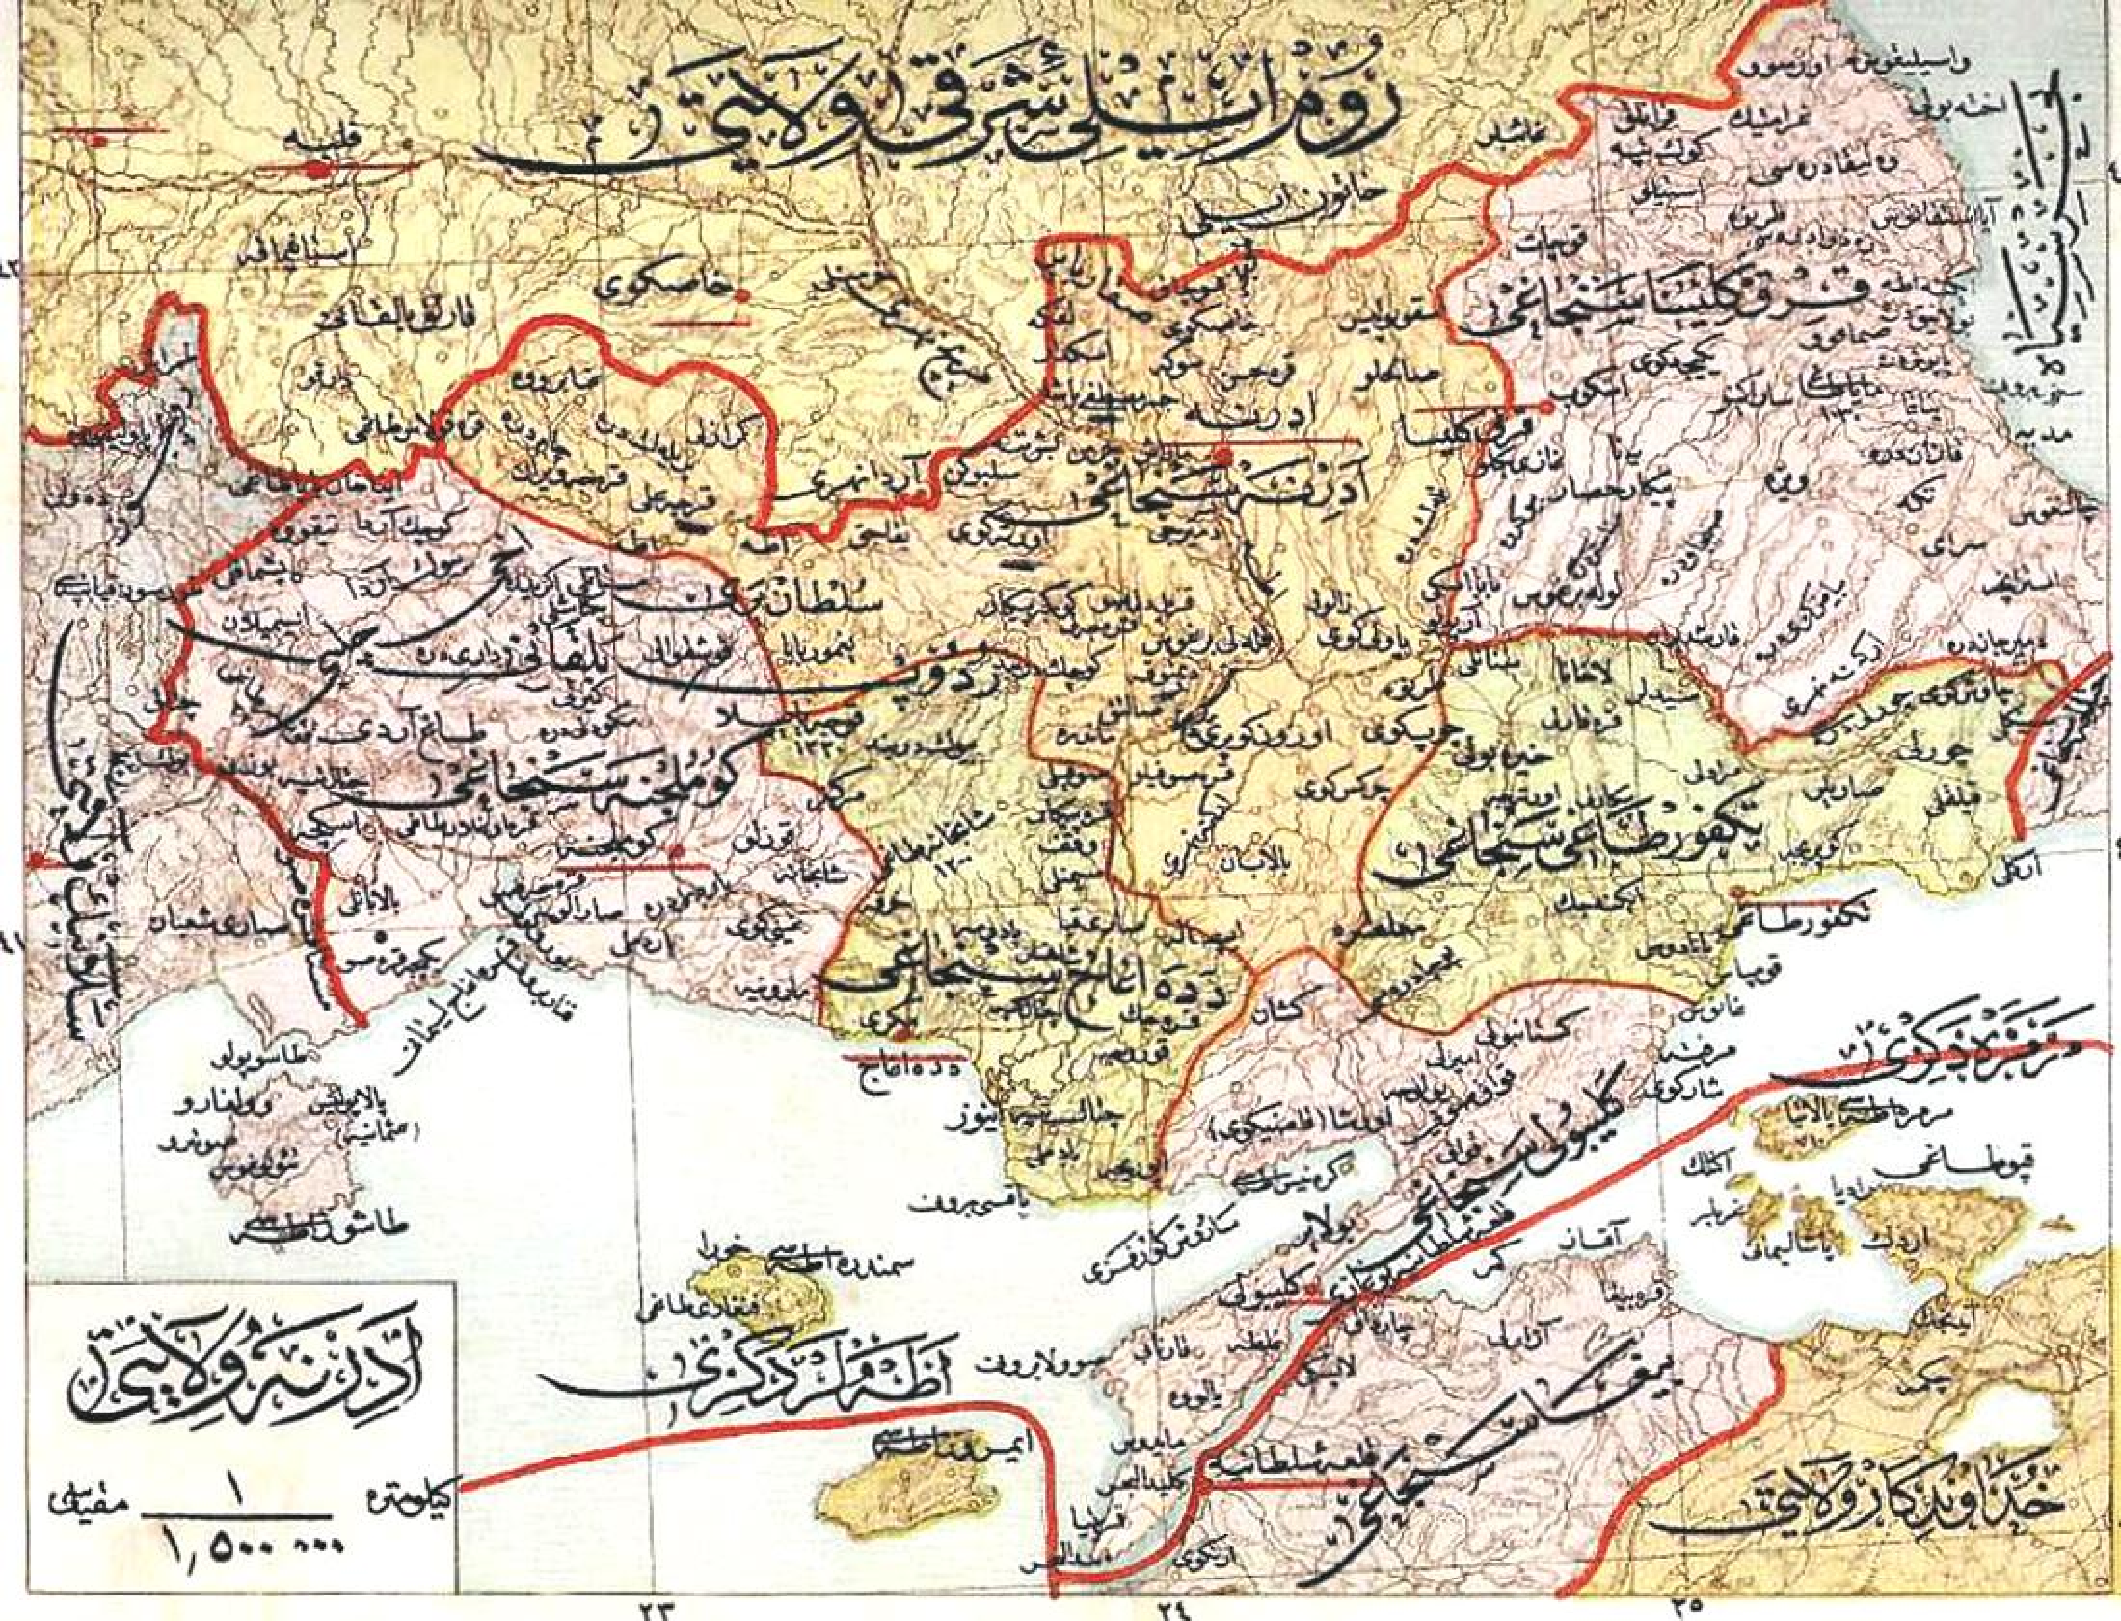 Adrianople_Vilayet_%E2%80%94_Memalik-i_Mahruse-i_Shahane-ye_Mahsus_Mukemmel_ve_Mufassal_Atlas_%281907%29.jpg